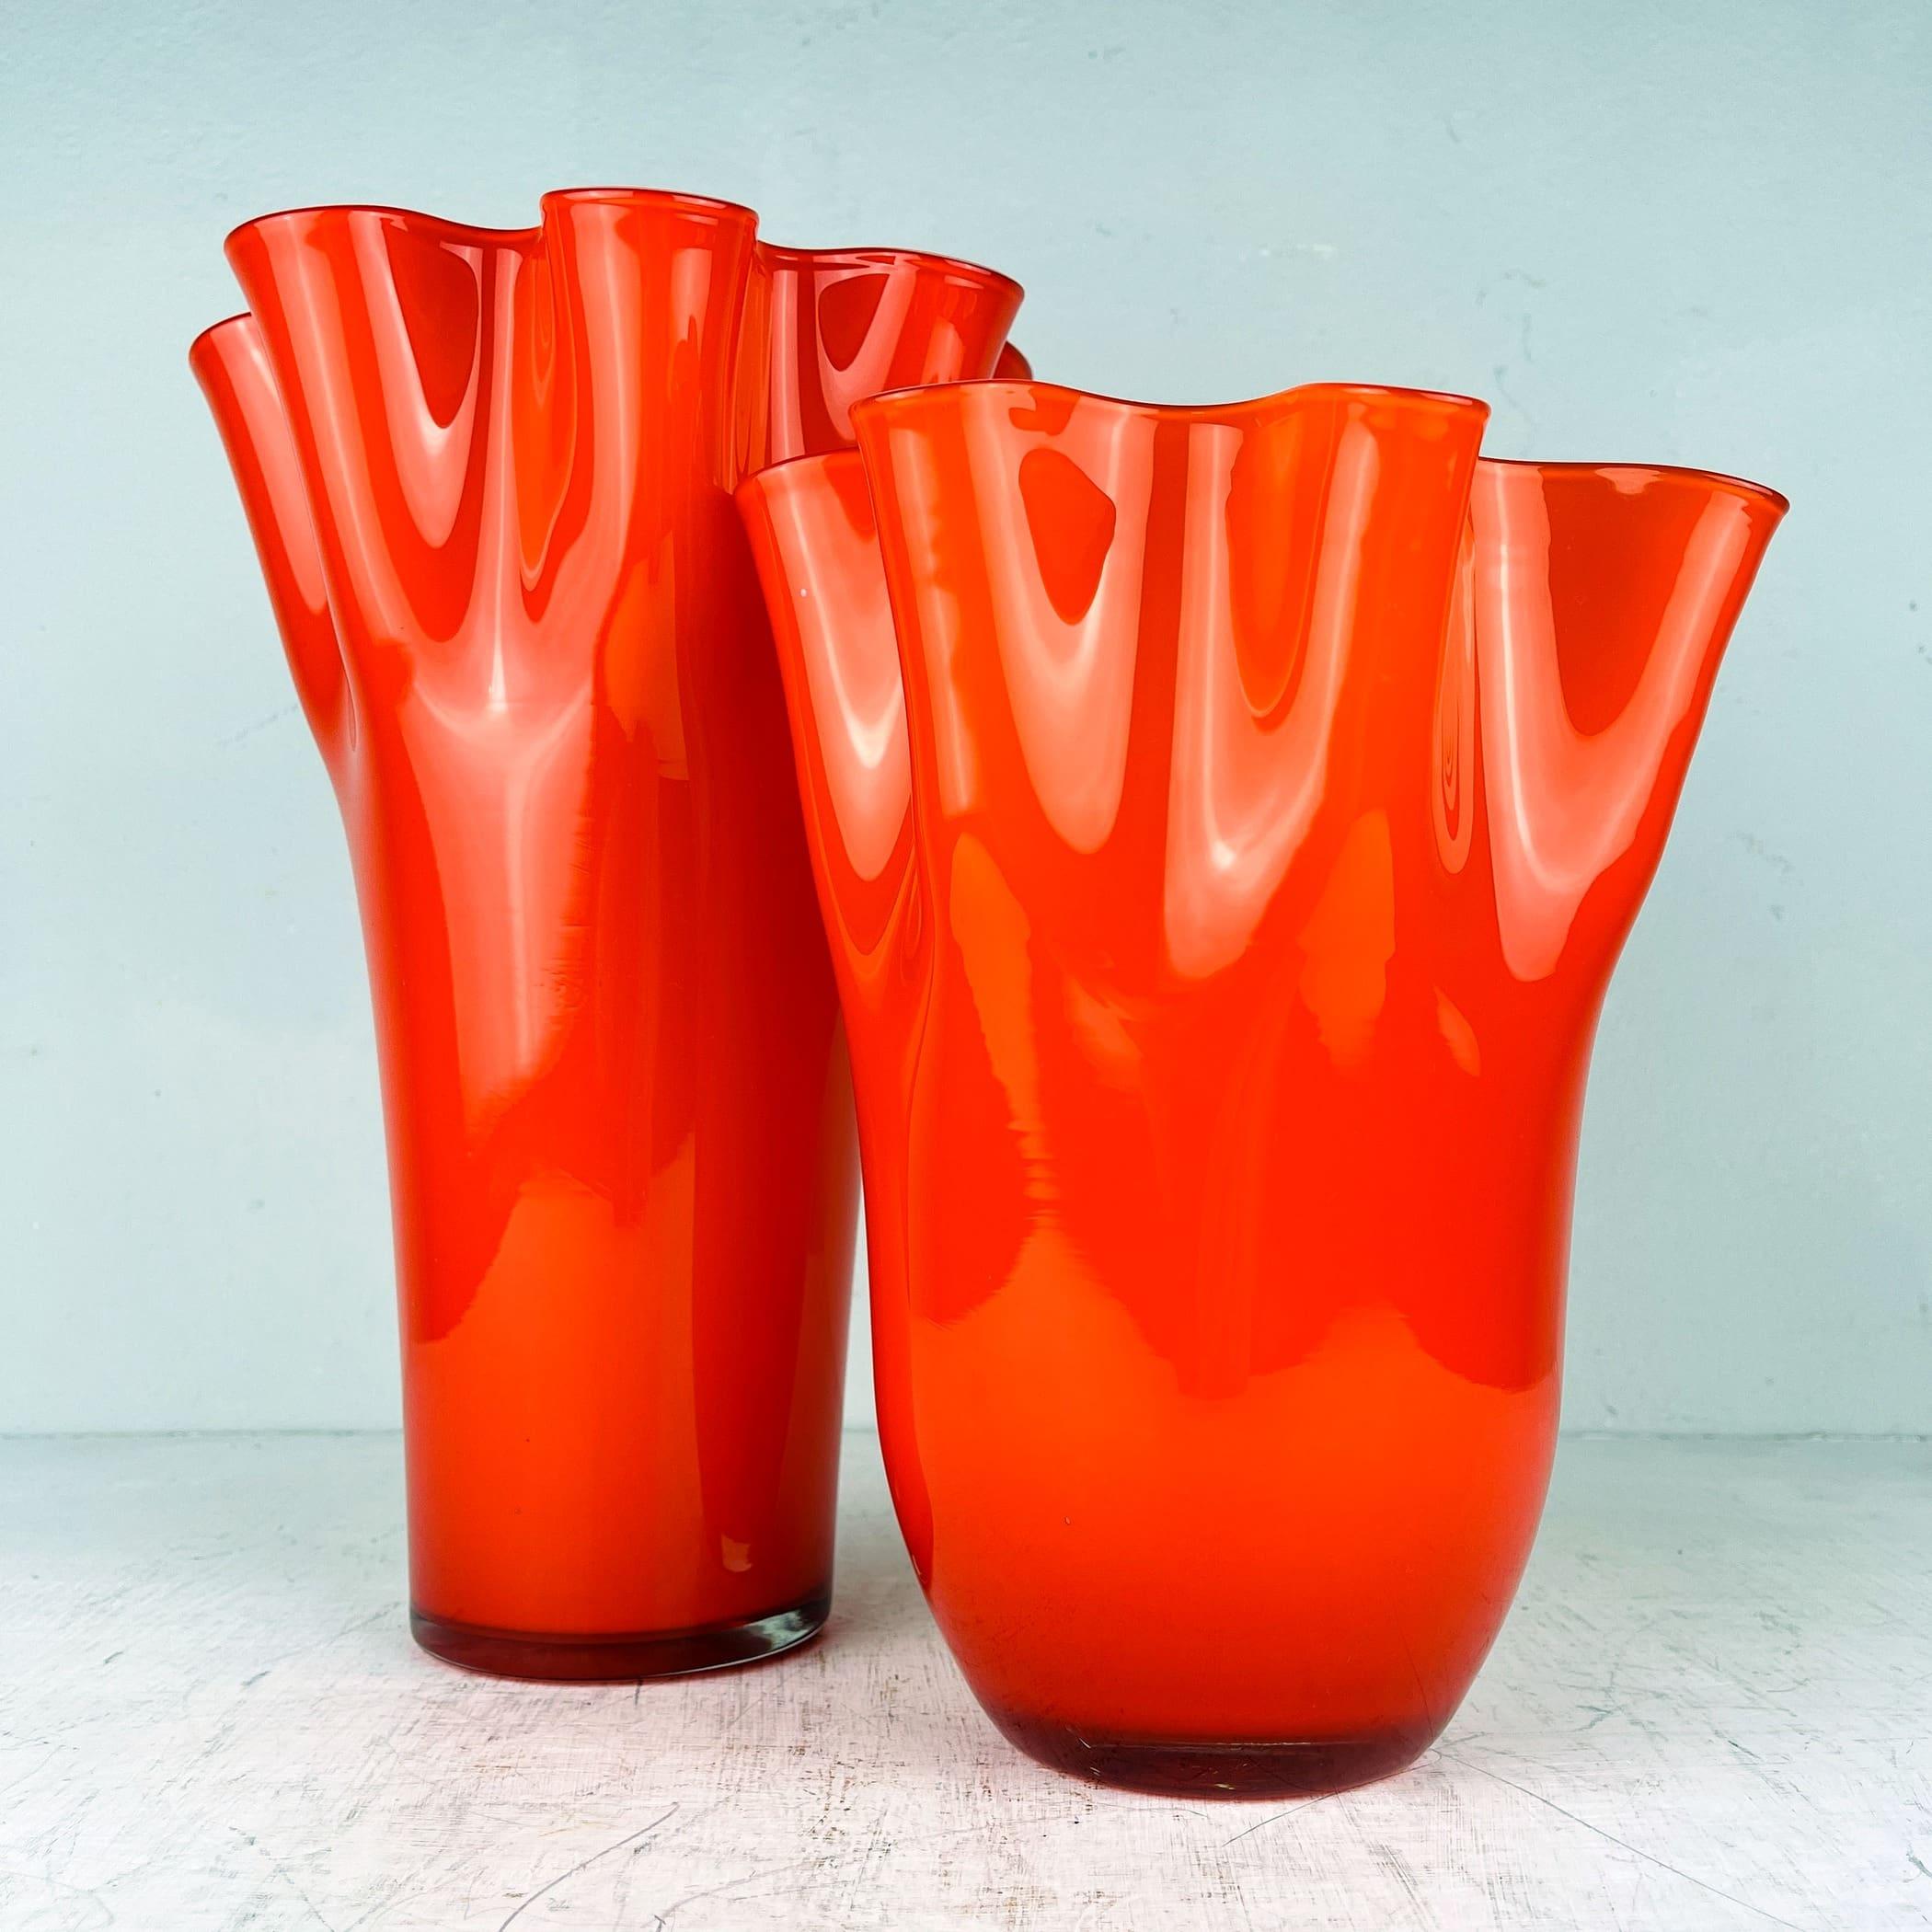 Pair of orange murano glass vases Fazzoletto Italy 1990s